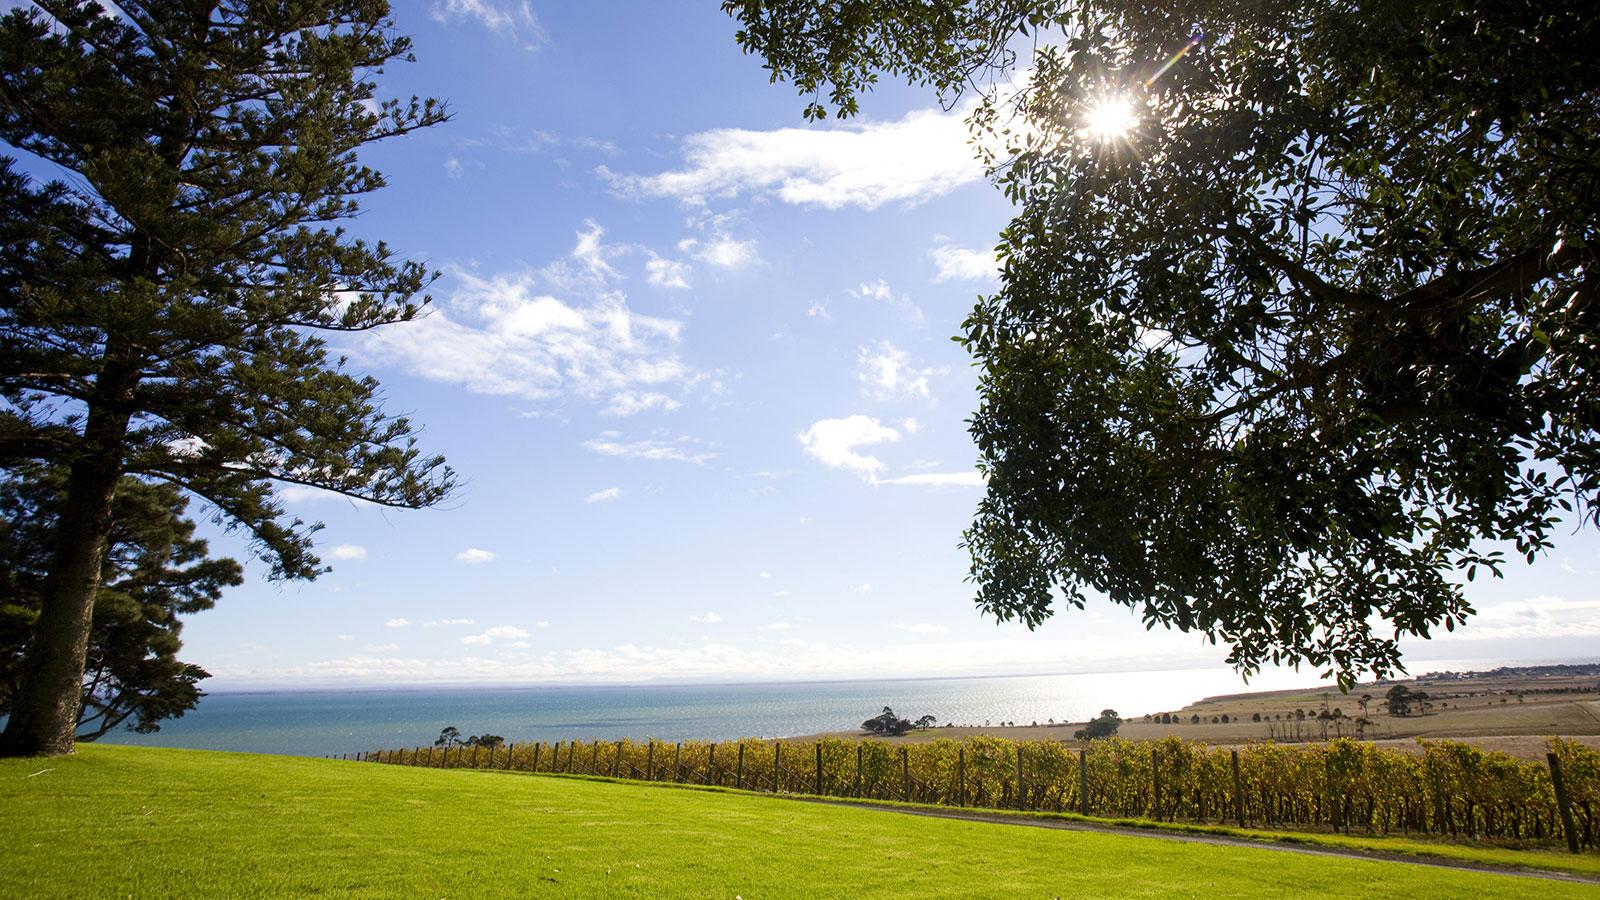 Spray Farm Estate, Geelong and the Bellarine, Victoria, Australia